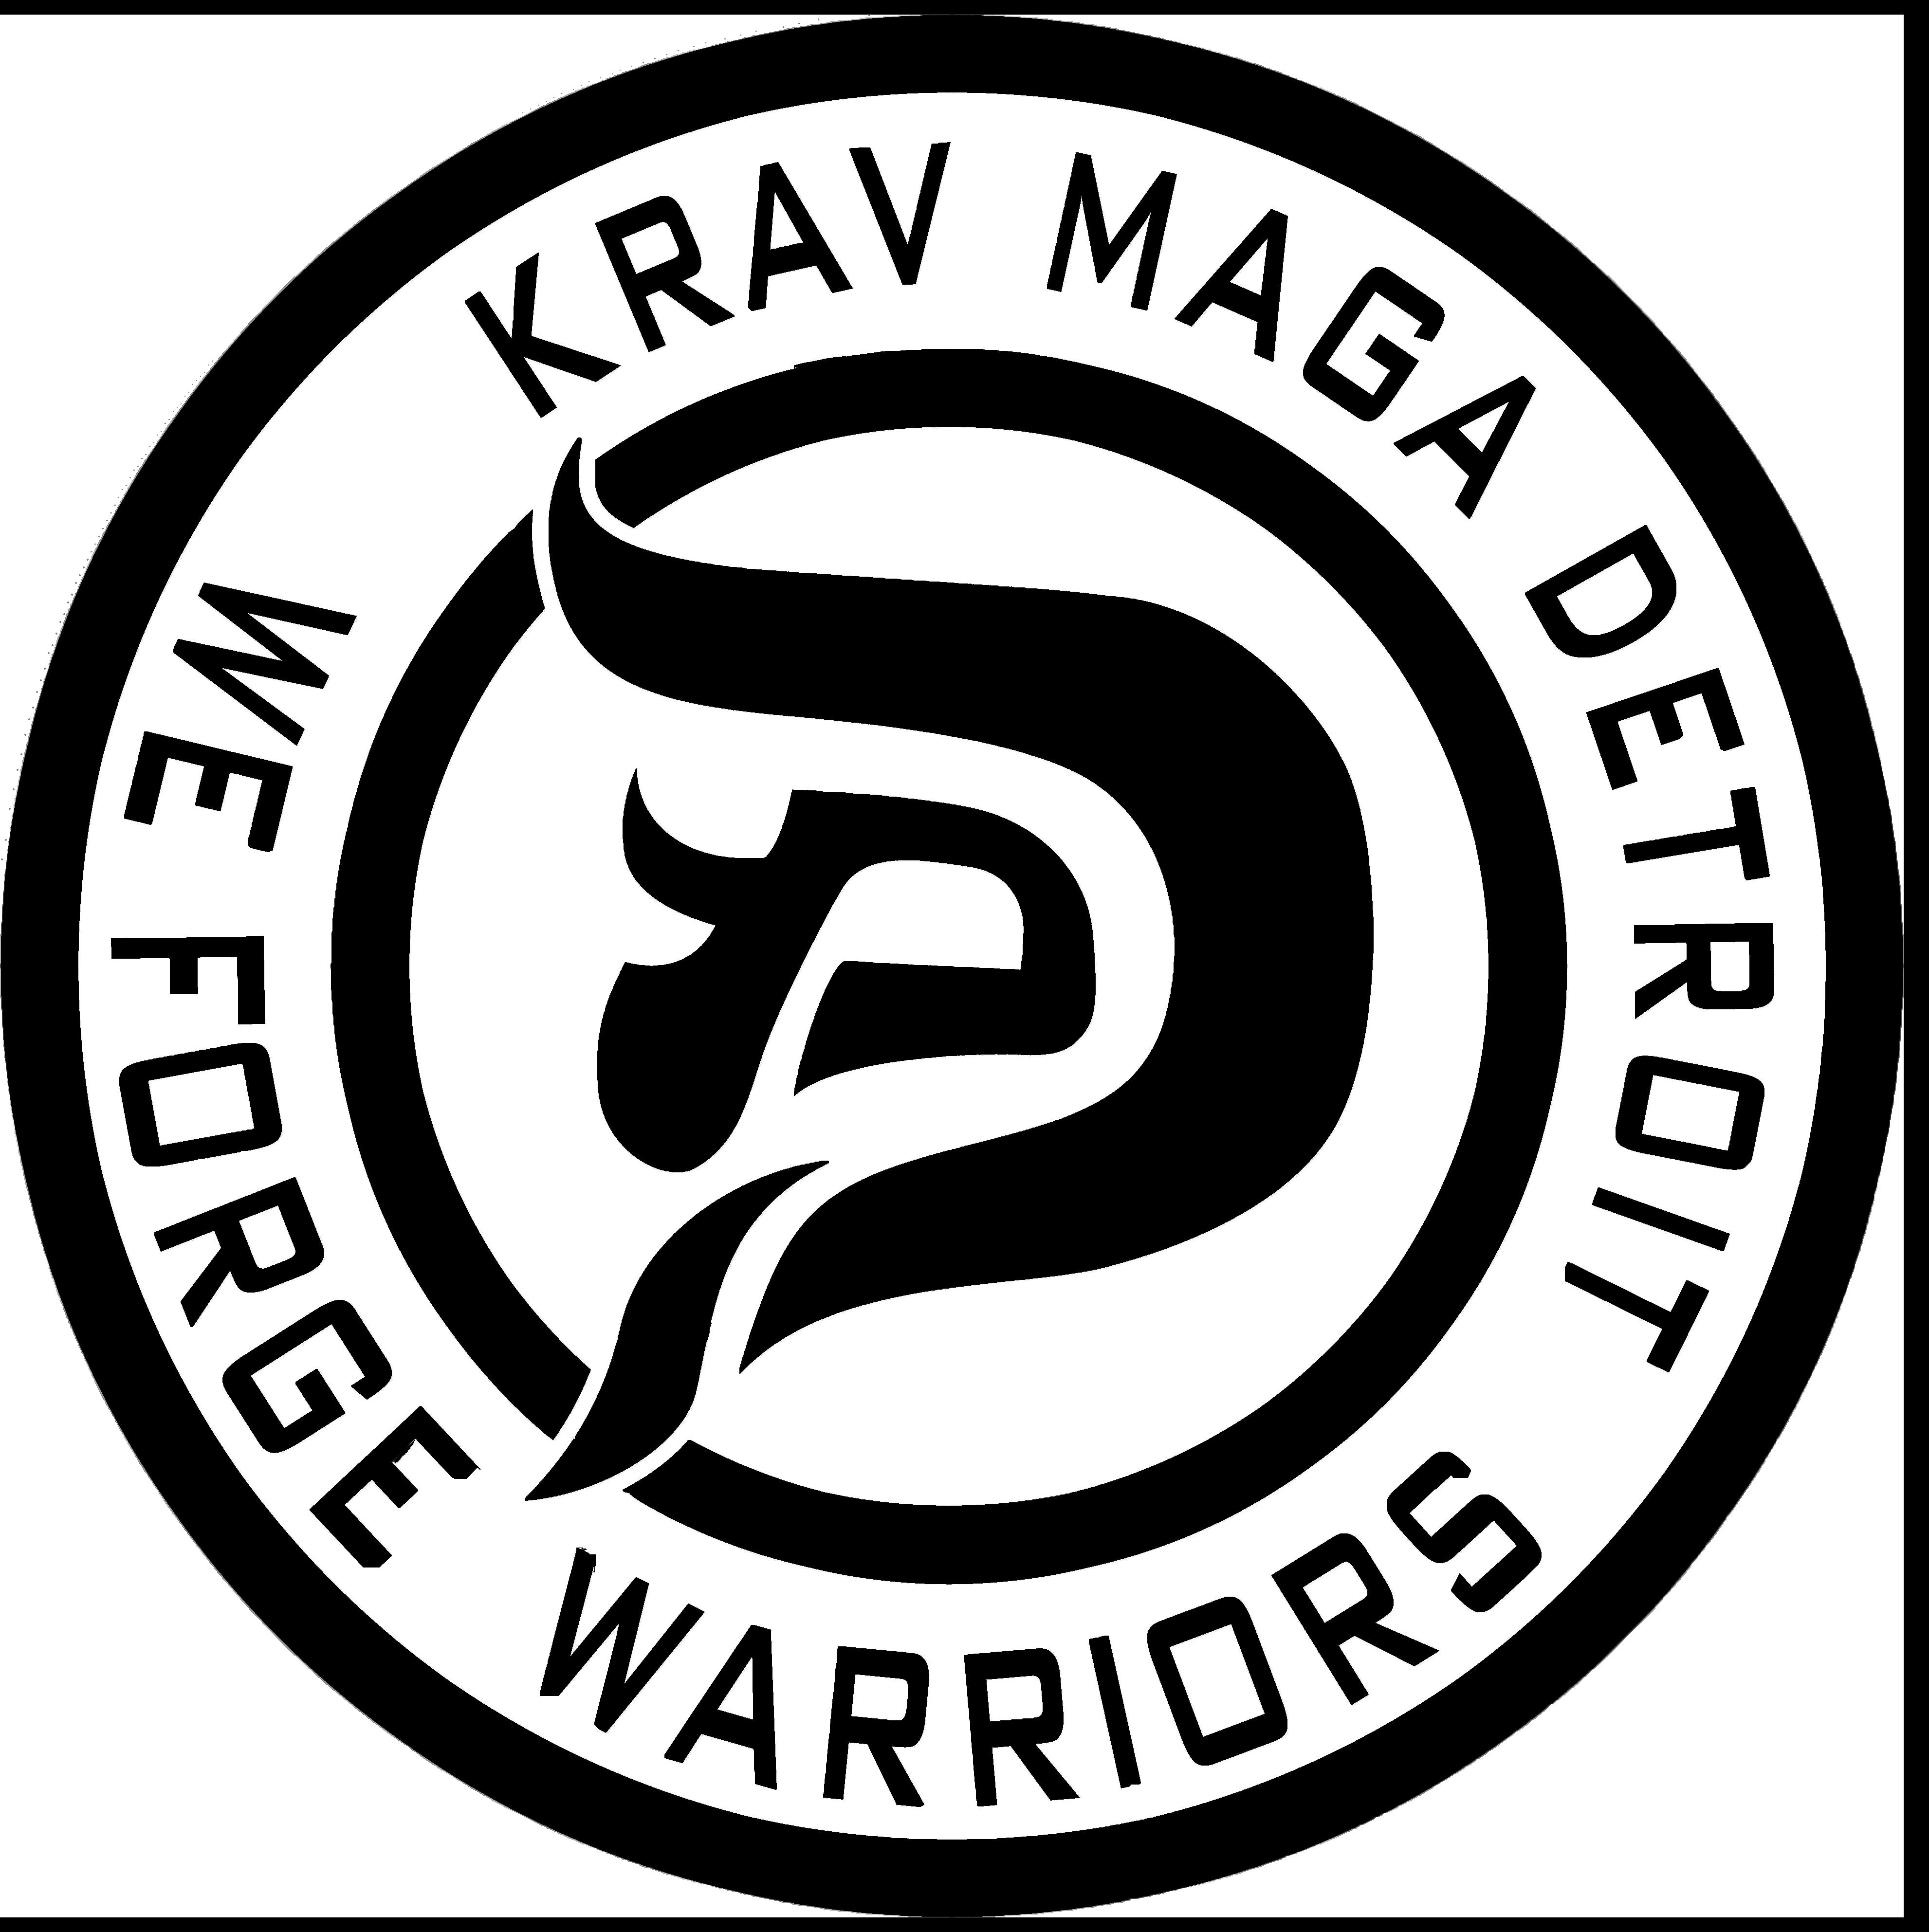 Krav Maga Detroit logo